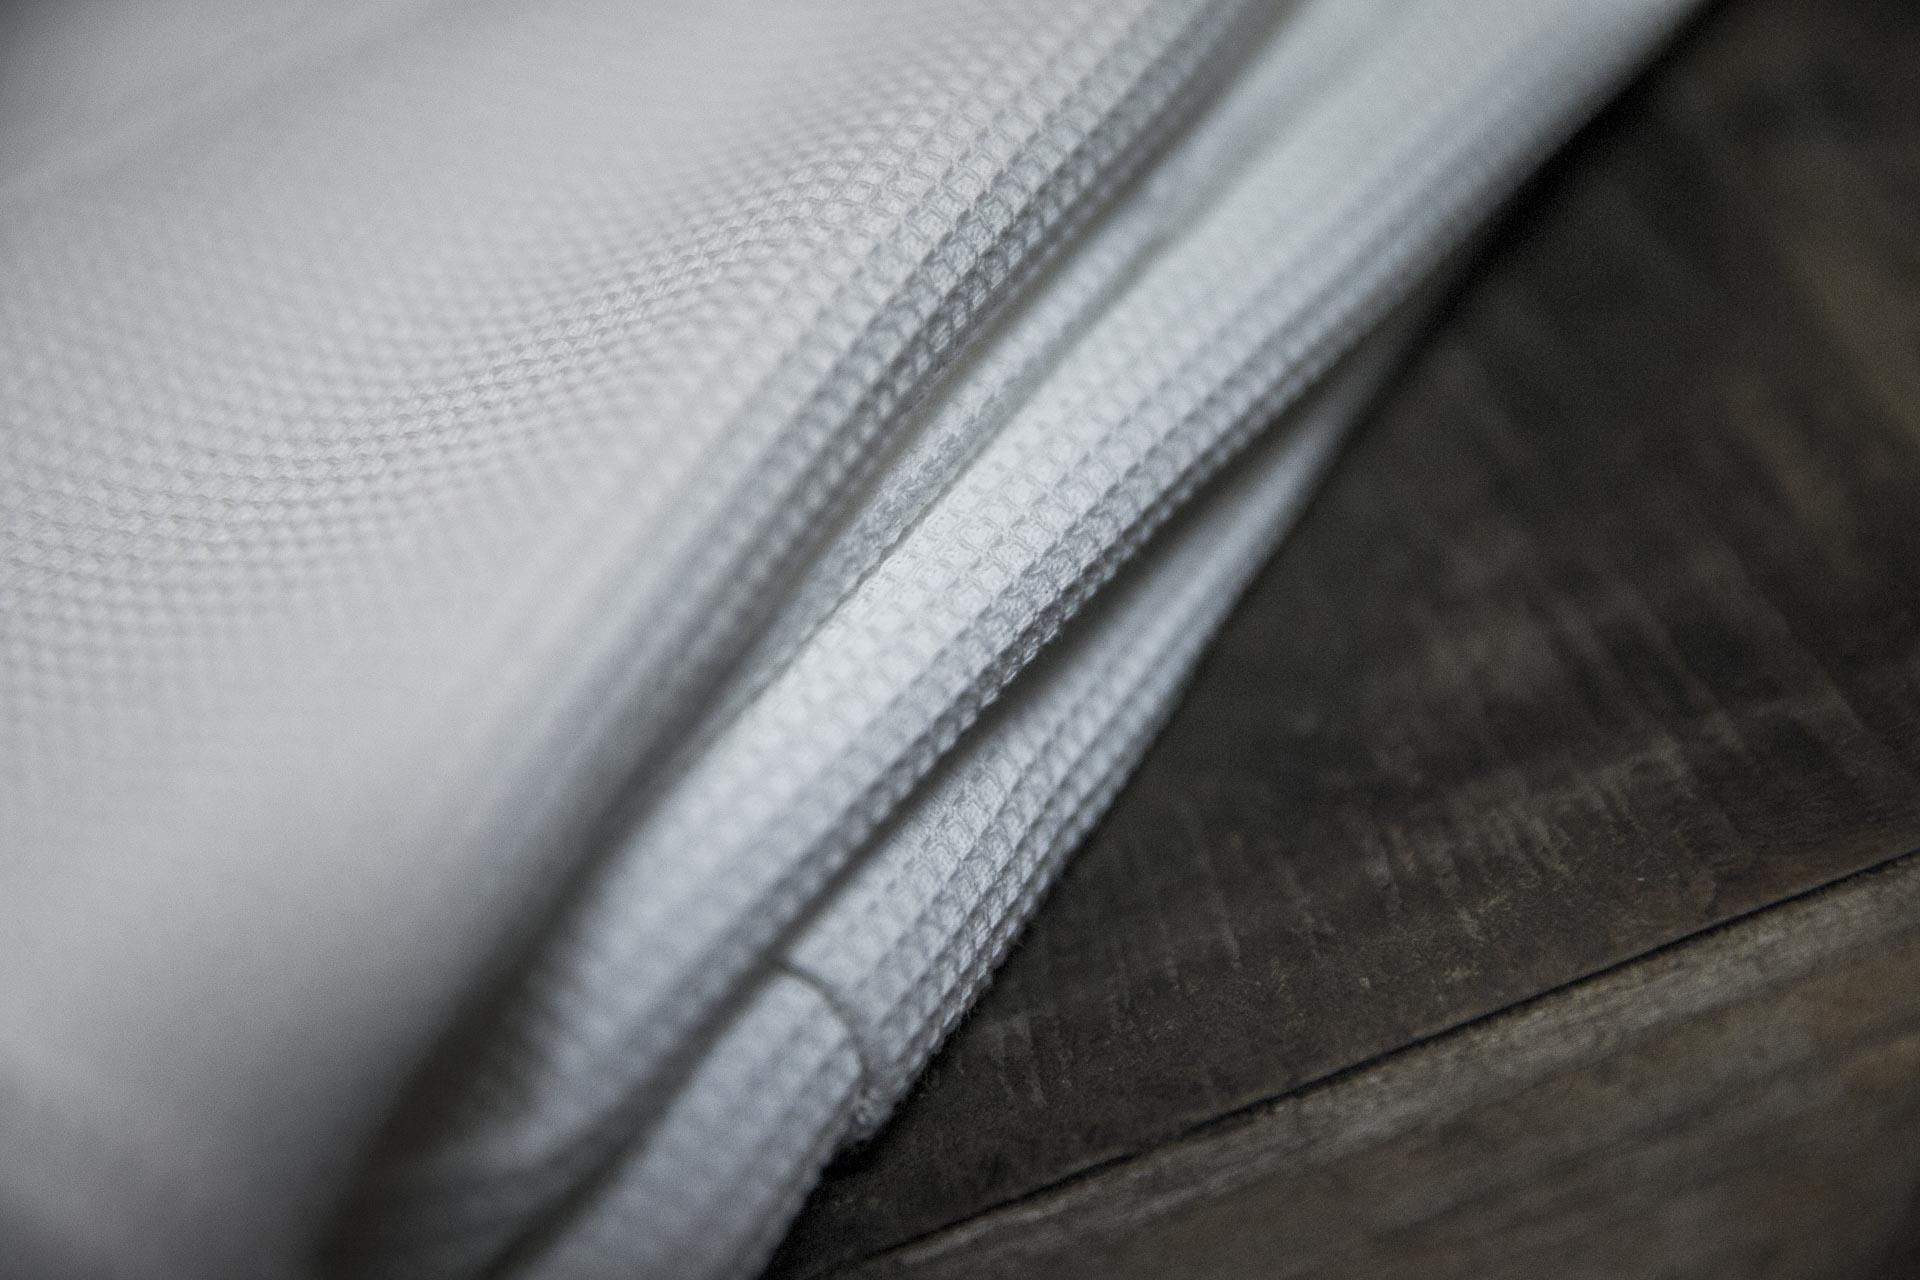 L&L_Textiles©stephane_leroy-E61R5839.jpg